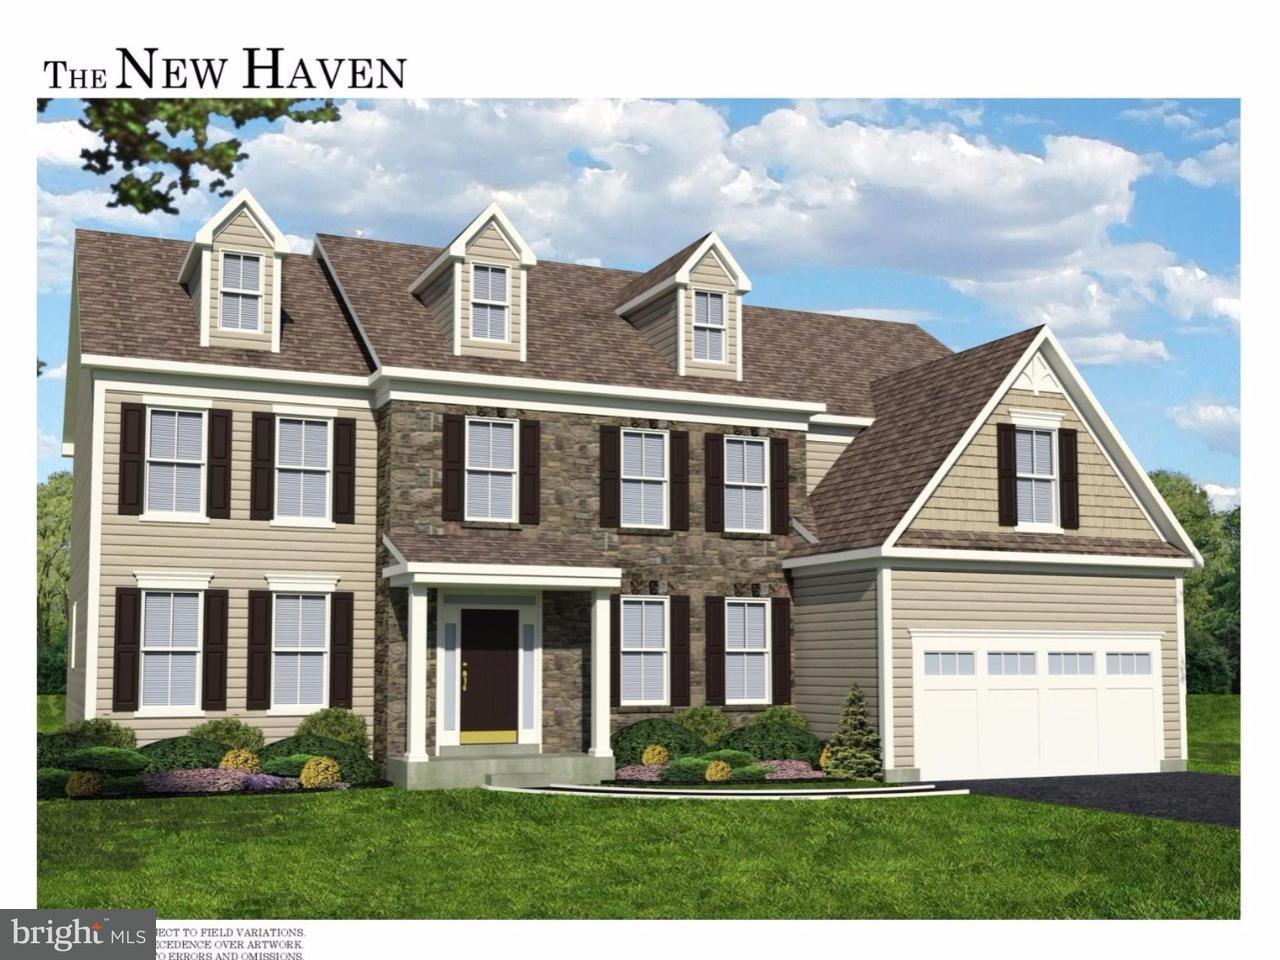 Single Family Home for Sale at Lot 25 S LANDMARK Lane Fort Washington, Pennsylvania 19034 United States